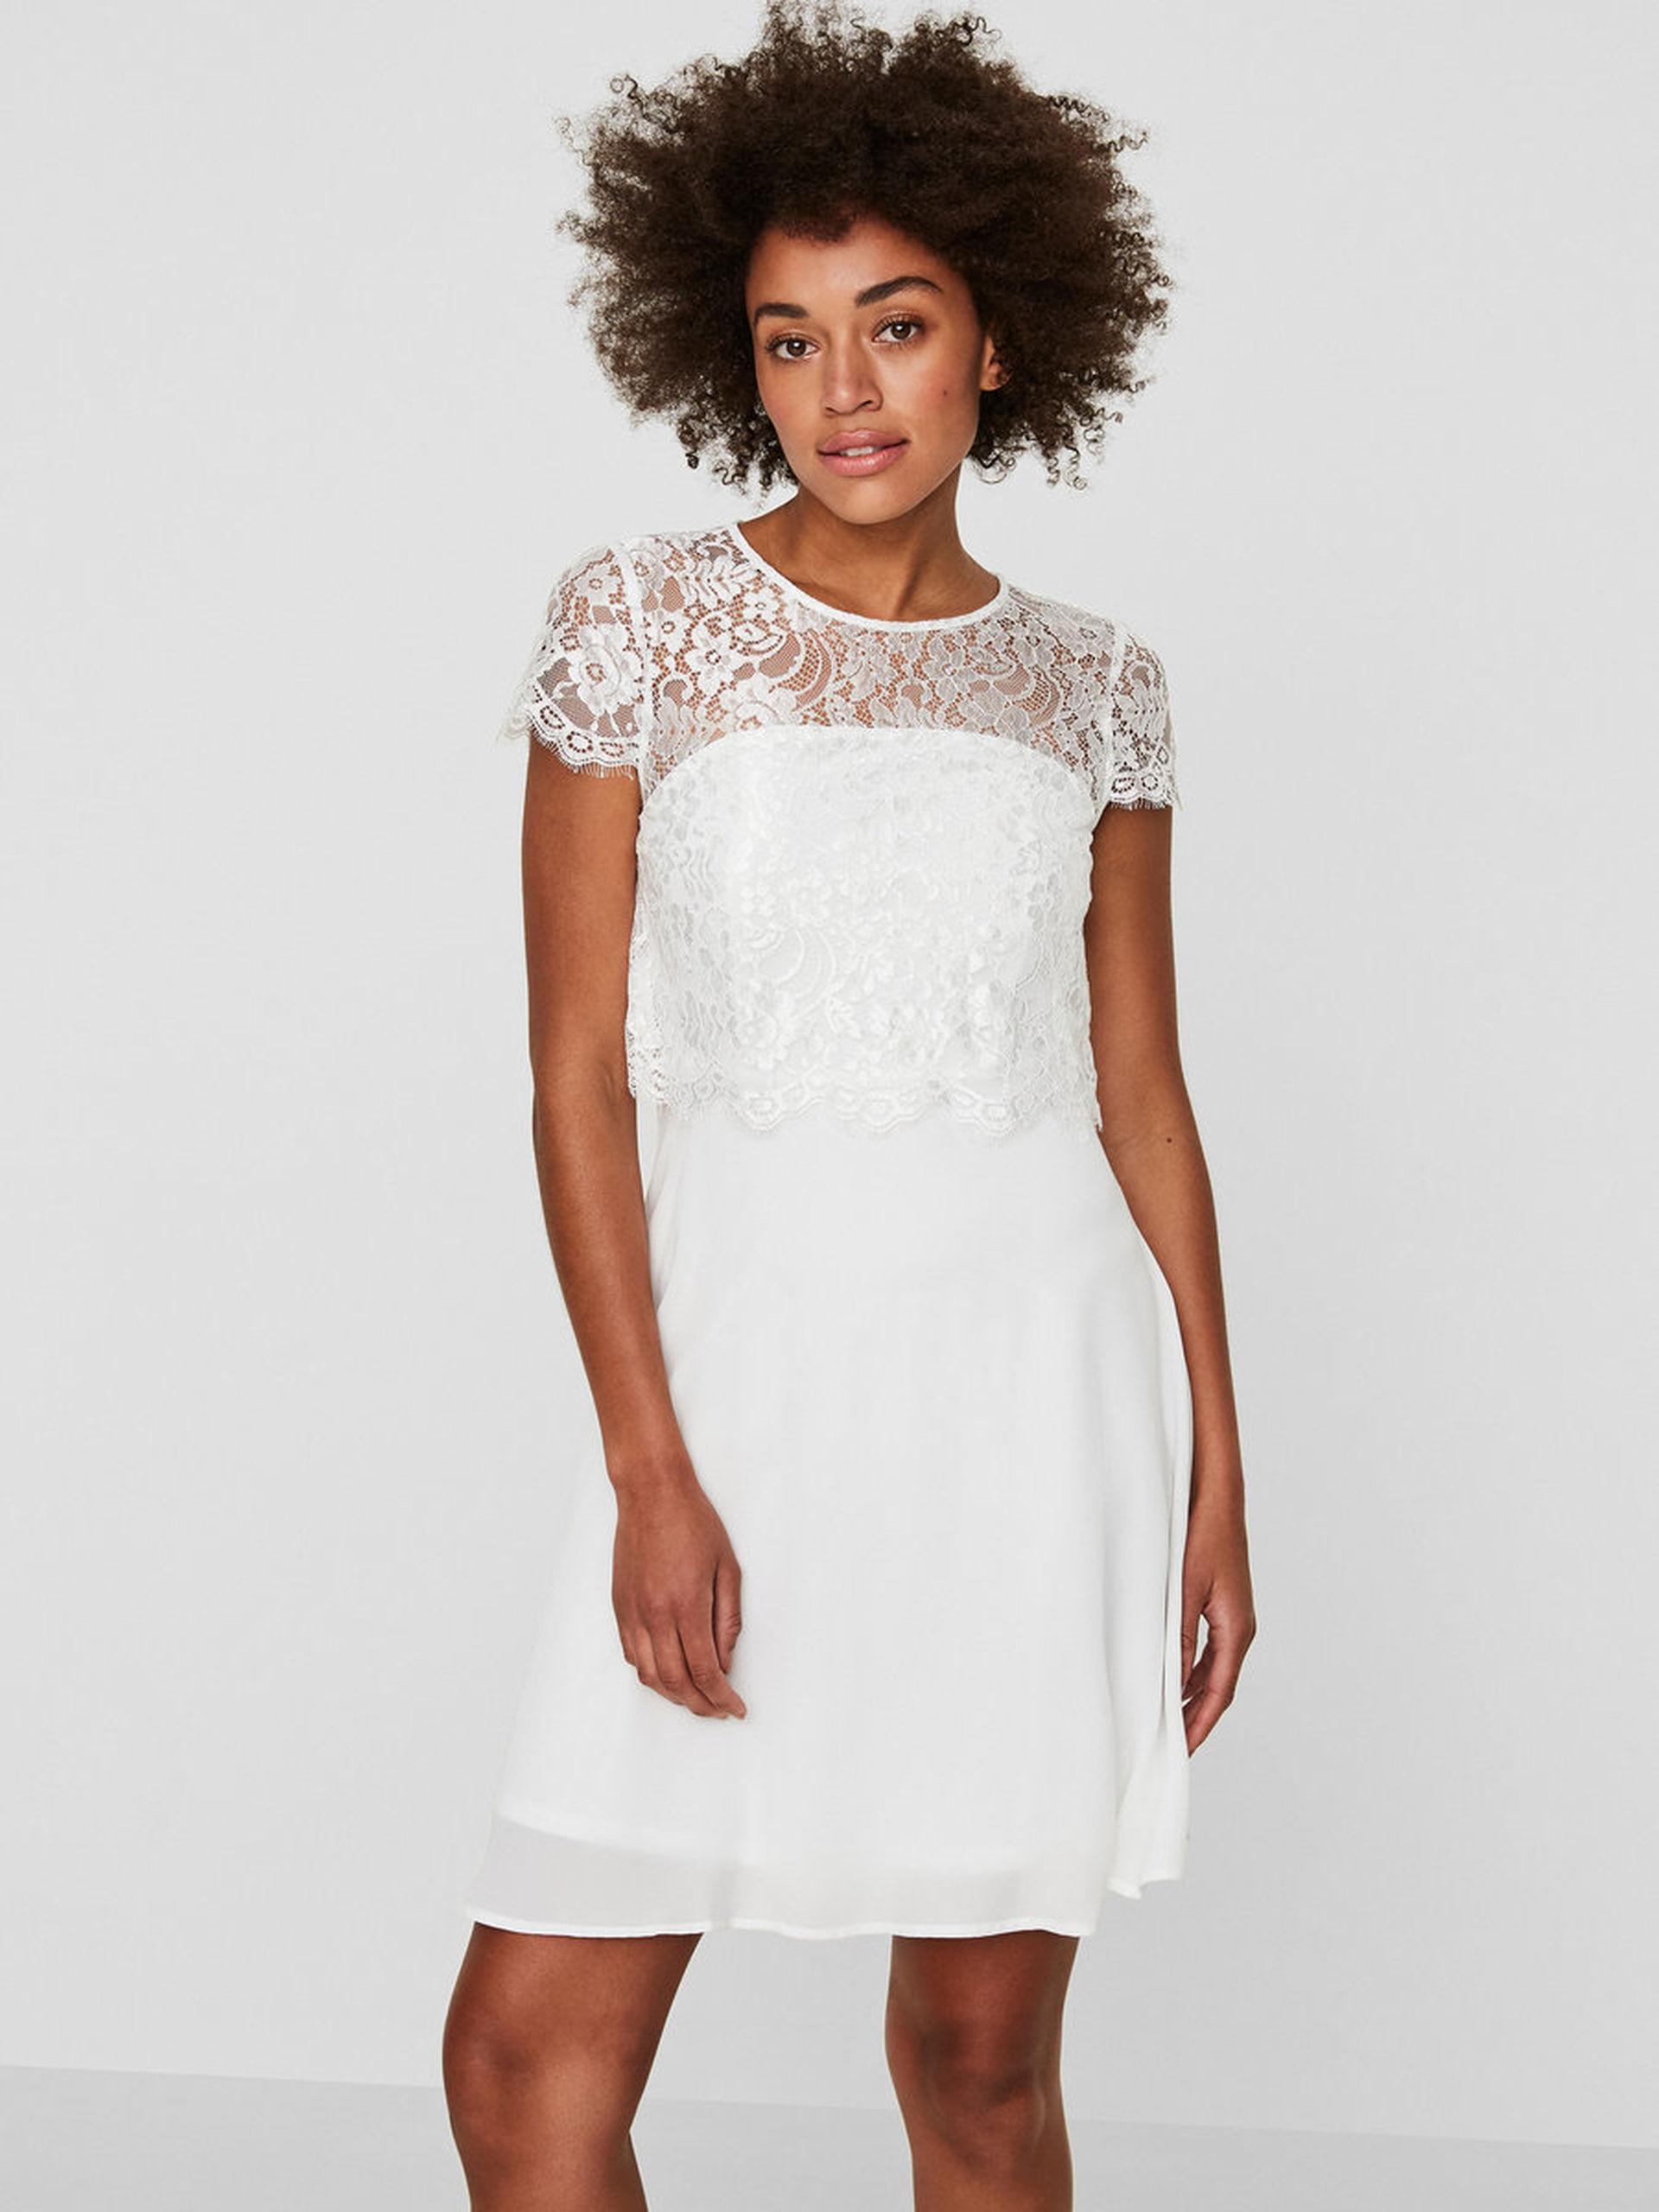 Lace MdVestido Veromoda blanco de Mademoiselle novia W9ED2YHI